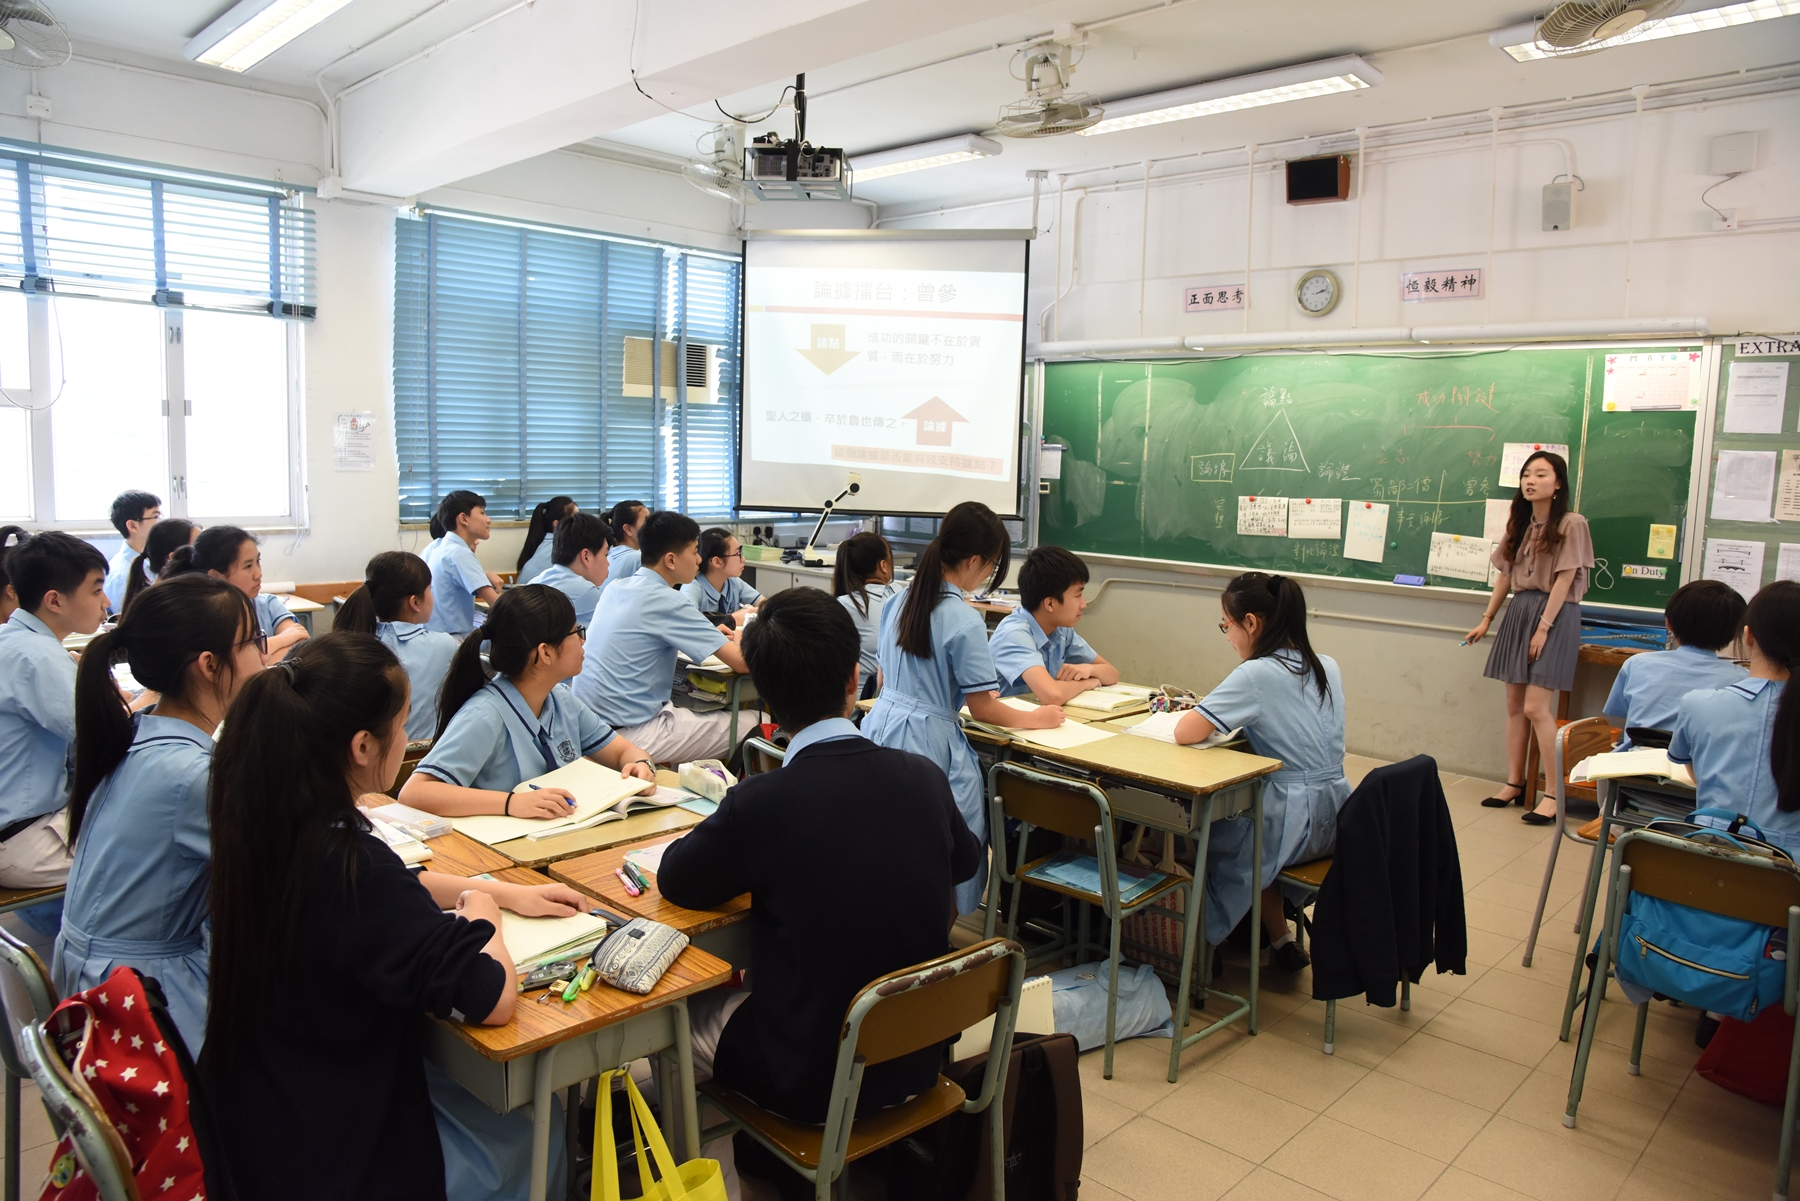 http://npc.edu.hk/sites/default/files/dsc_0666.jpg